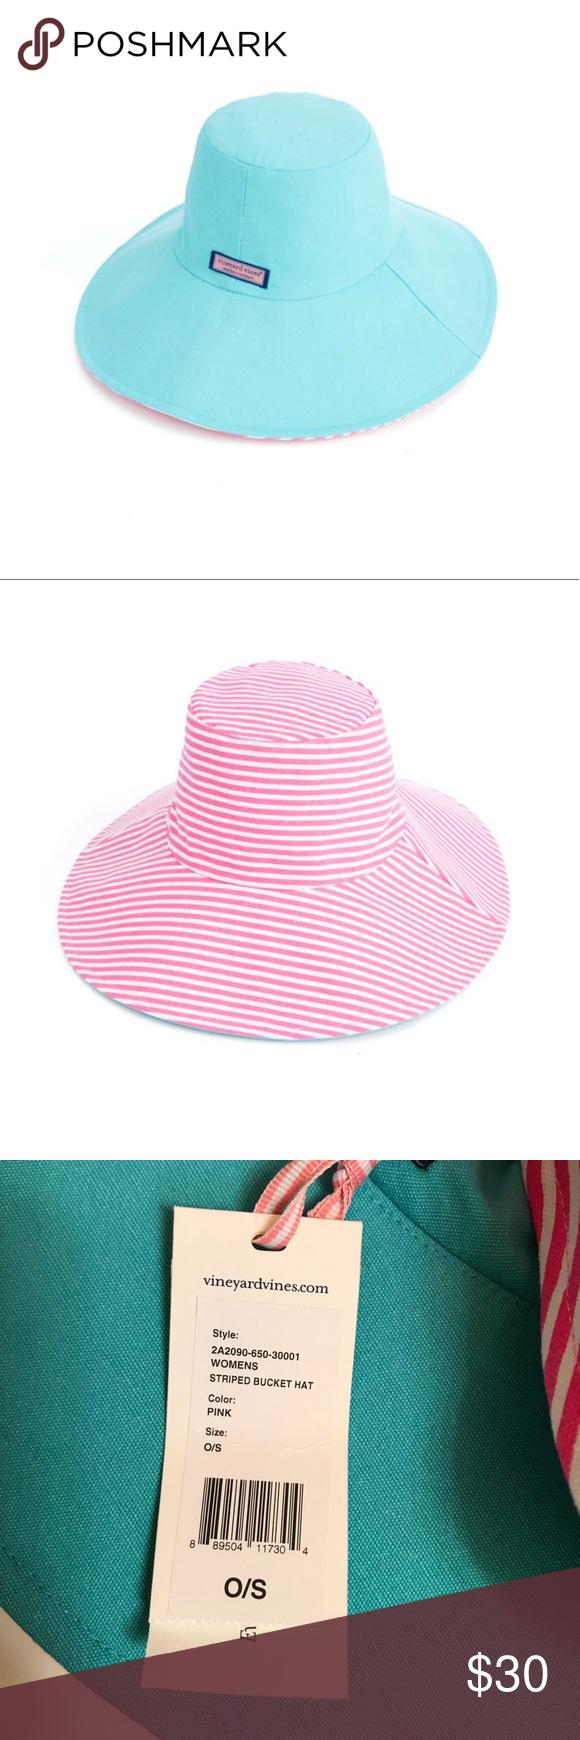 NWT Vineyard Vines reversible bucket hat NWT Vineyard Vines reversible bucket  hat. 100% cotton 53c7f8f1e3a